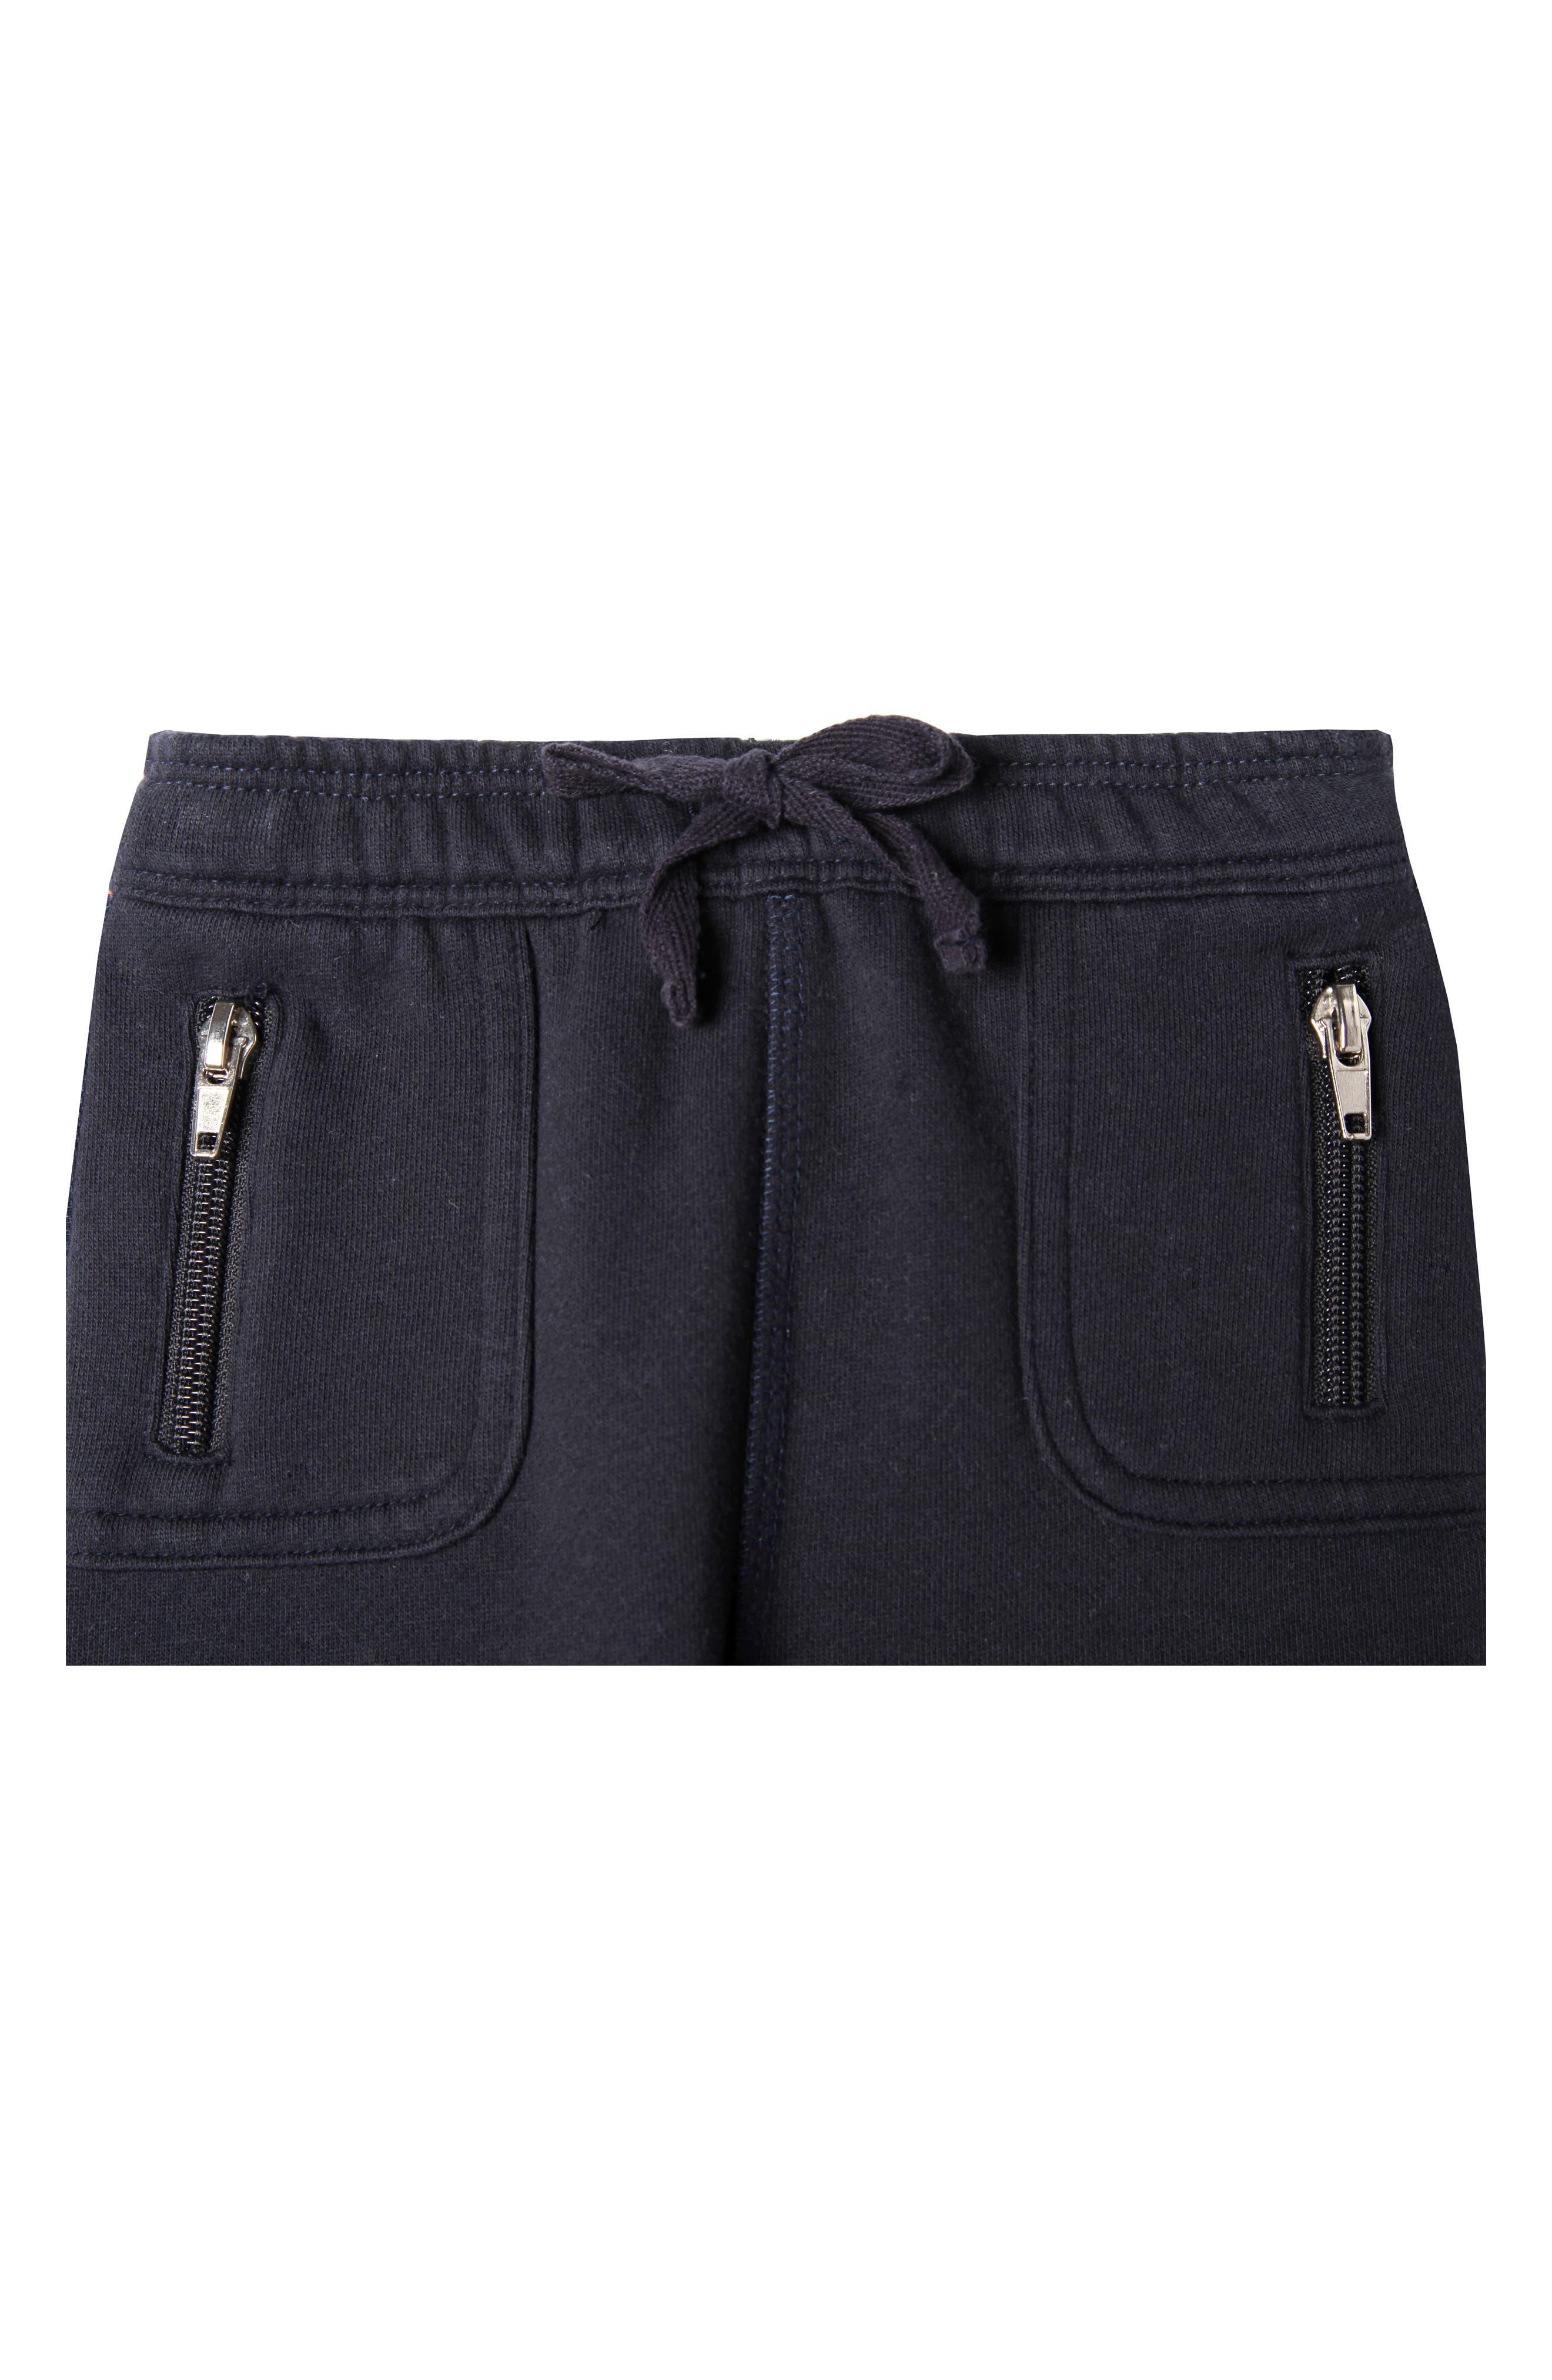 Mercer Organic Cotton Jogger Pants,                             Alternate thumbnail 2, color,                             True Navy